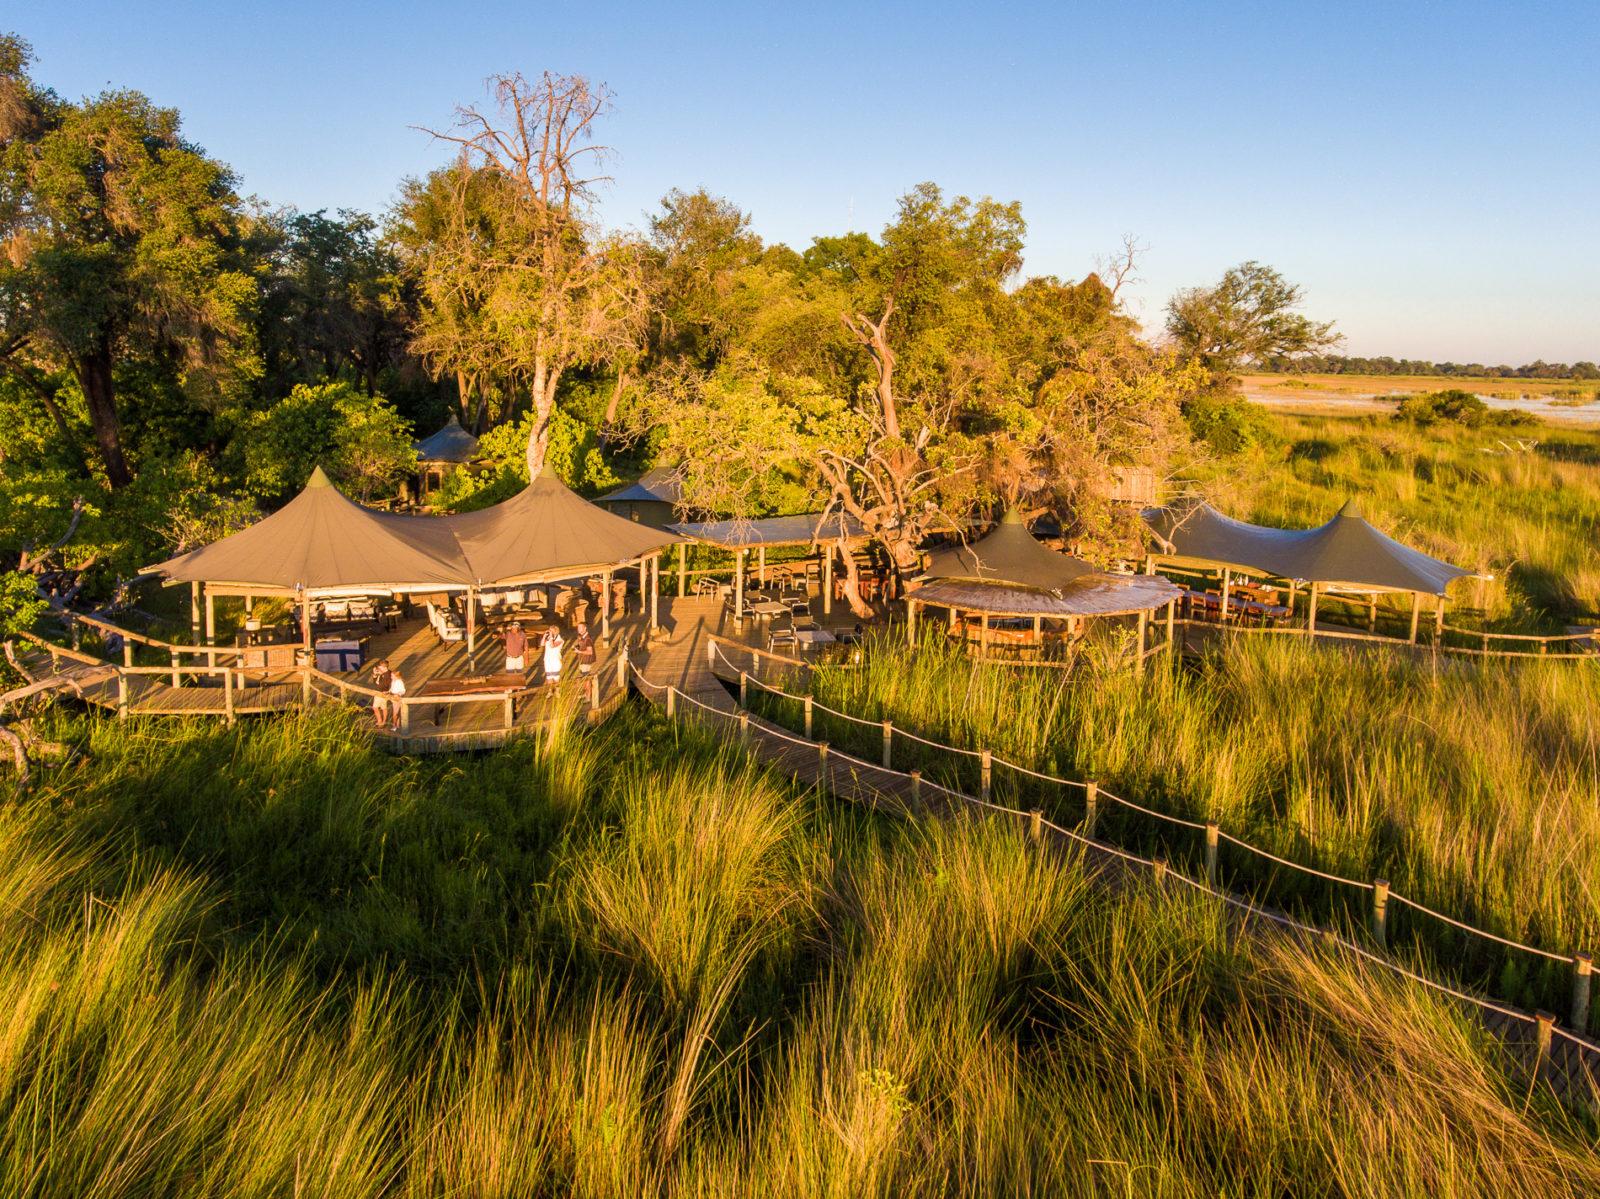 Little Vumbura Camp shares a concession with Vumbura Plains Camp